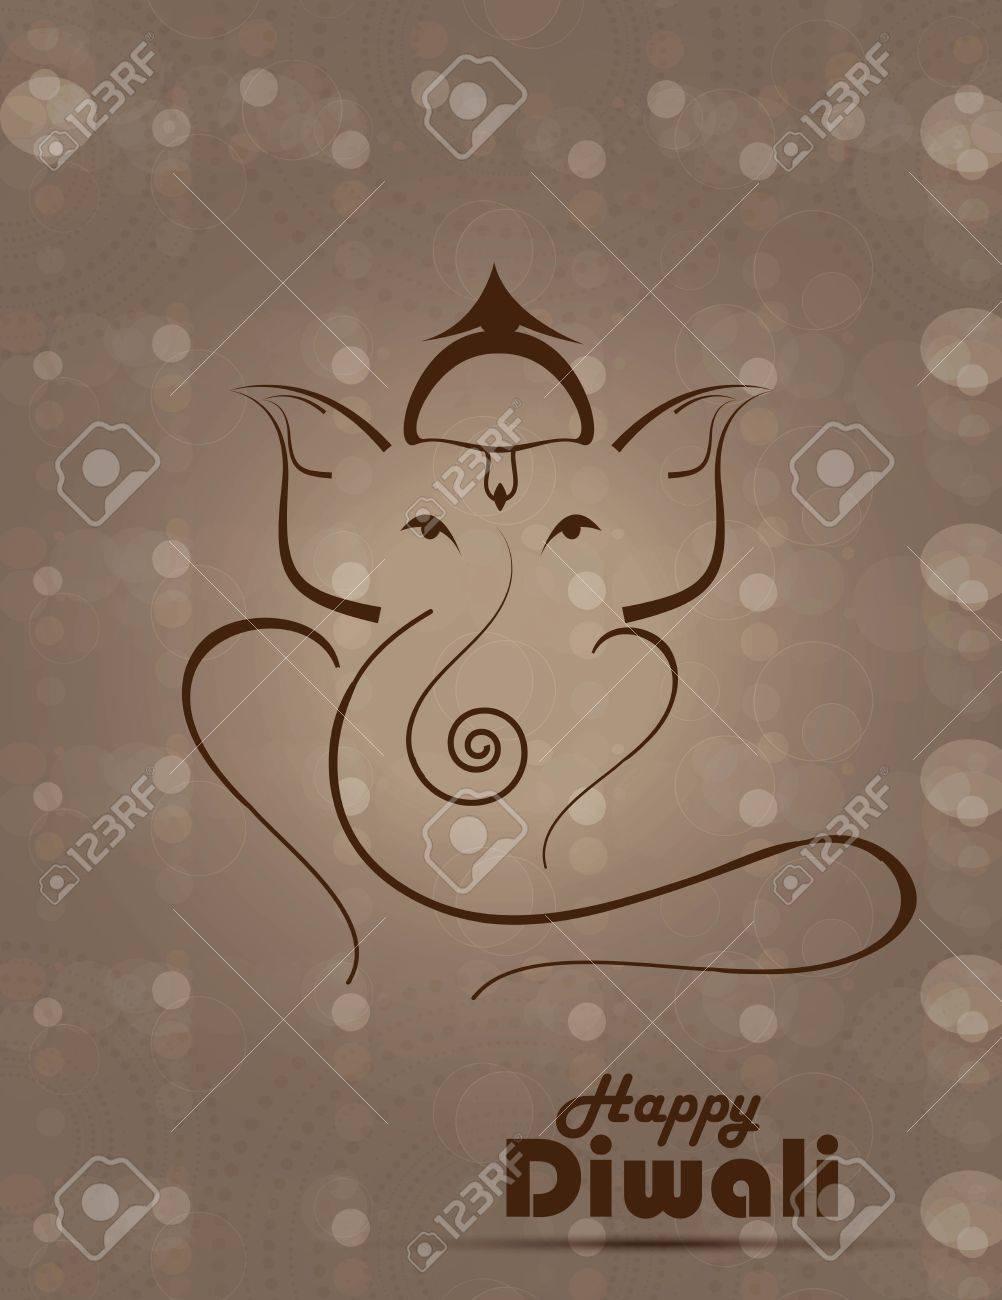 Artistic colorful  illustration of Hindu Lord Ganesha vector design Stock Vector - 18352596